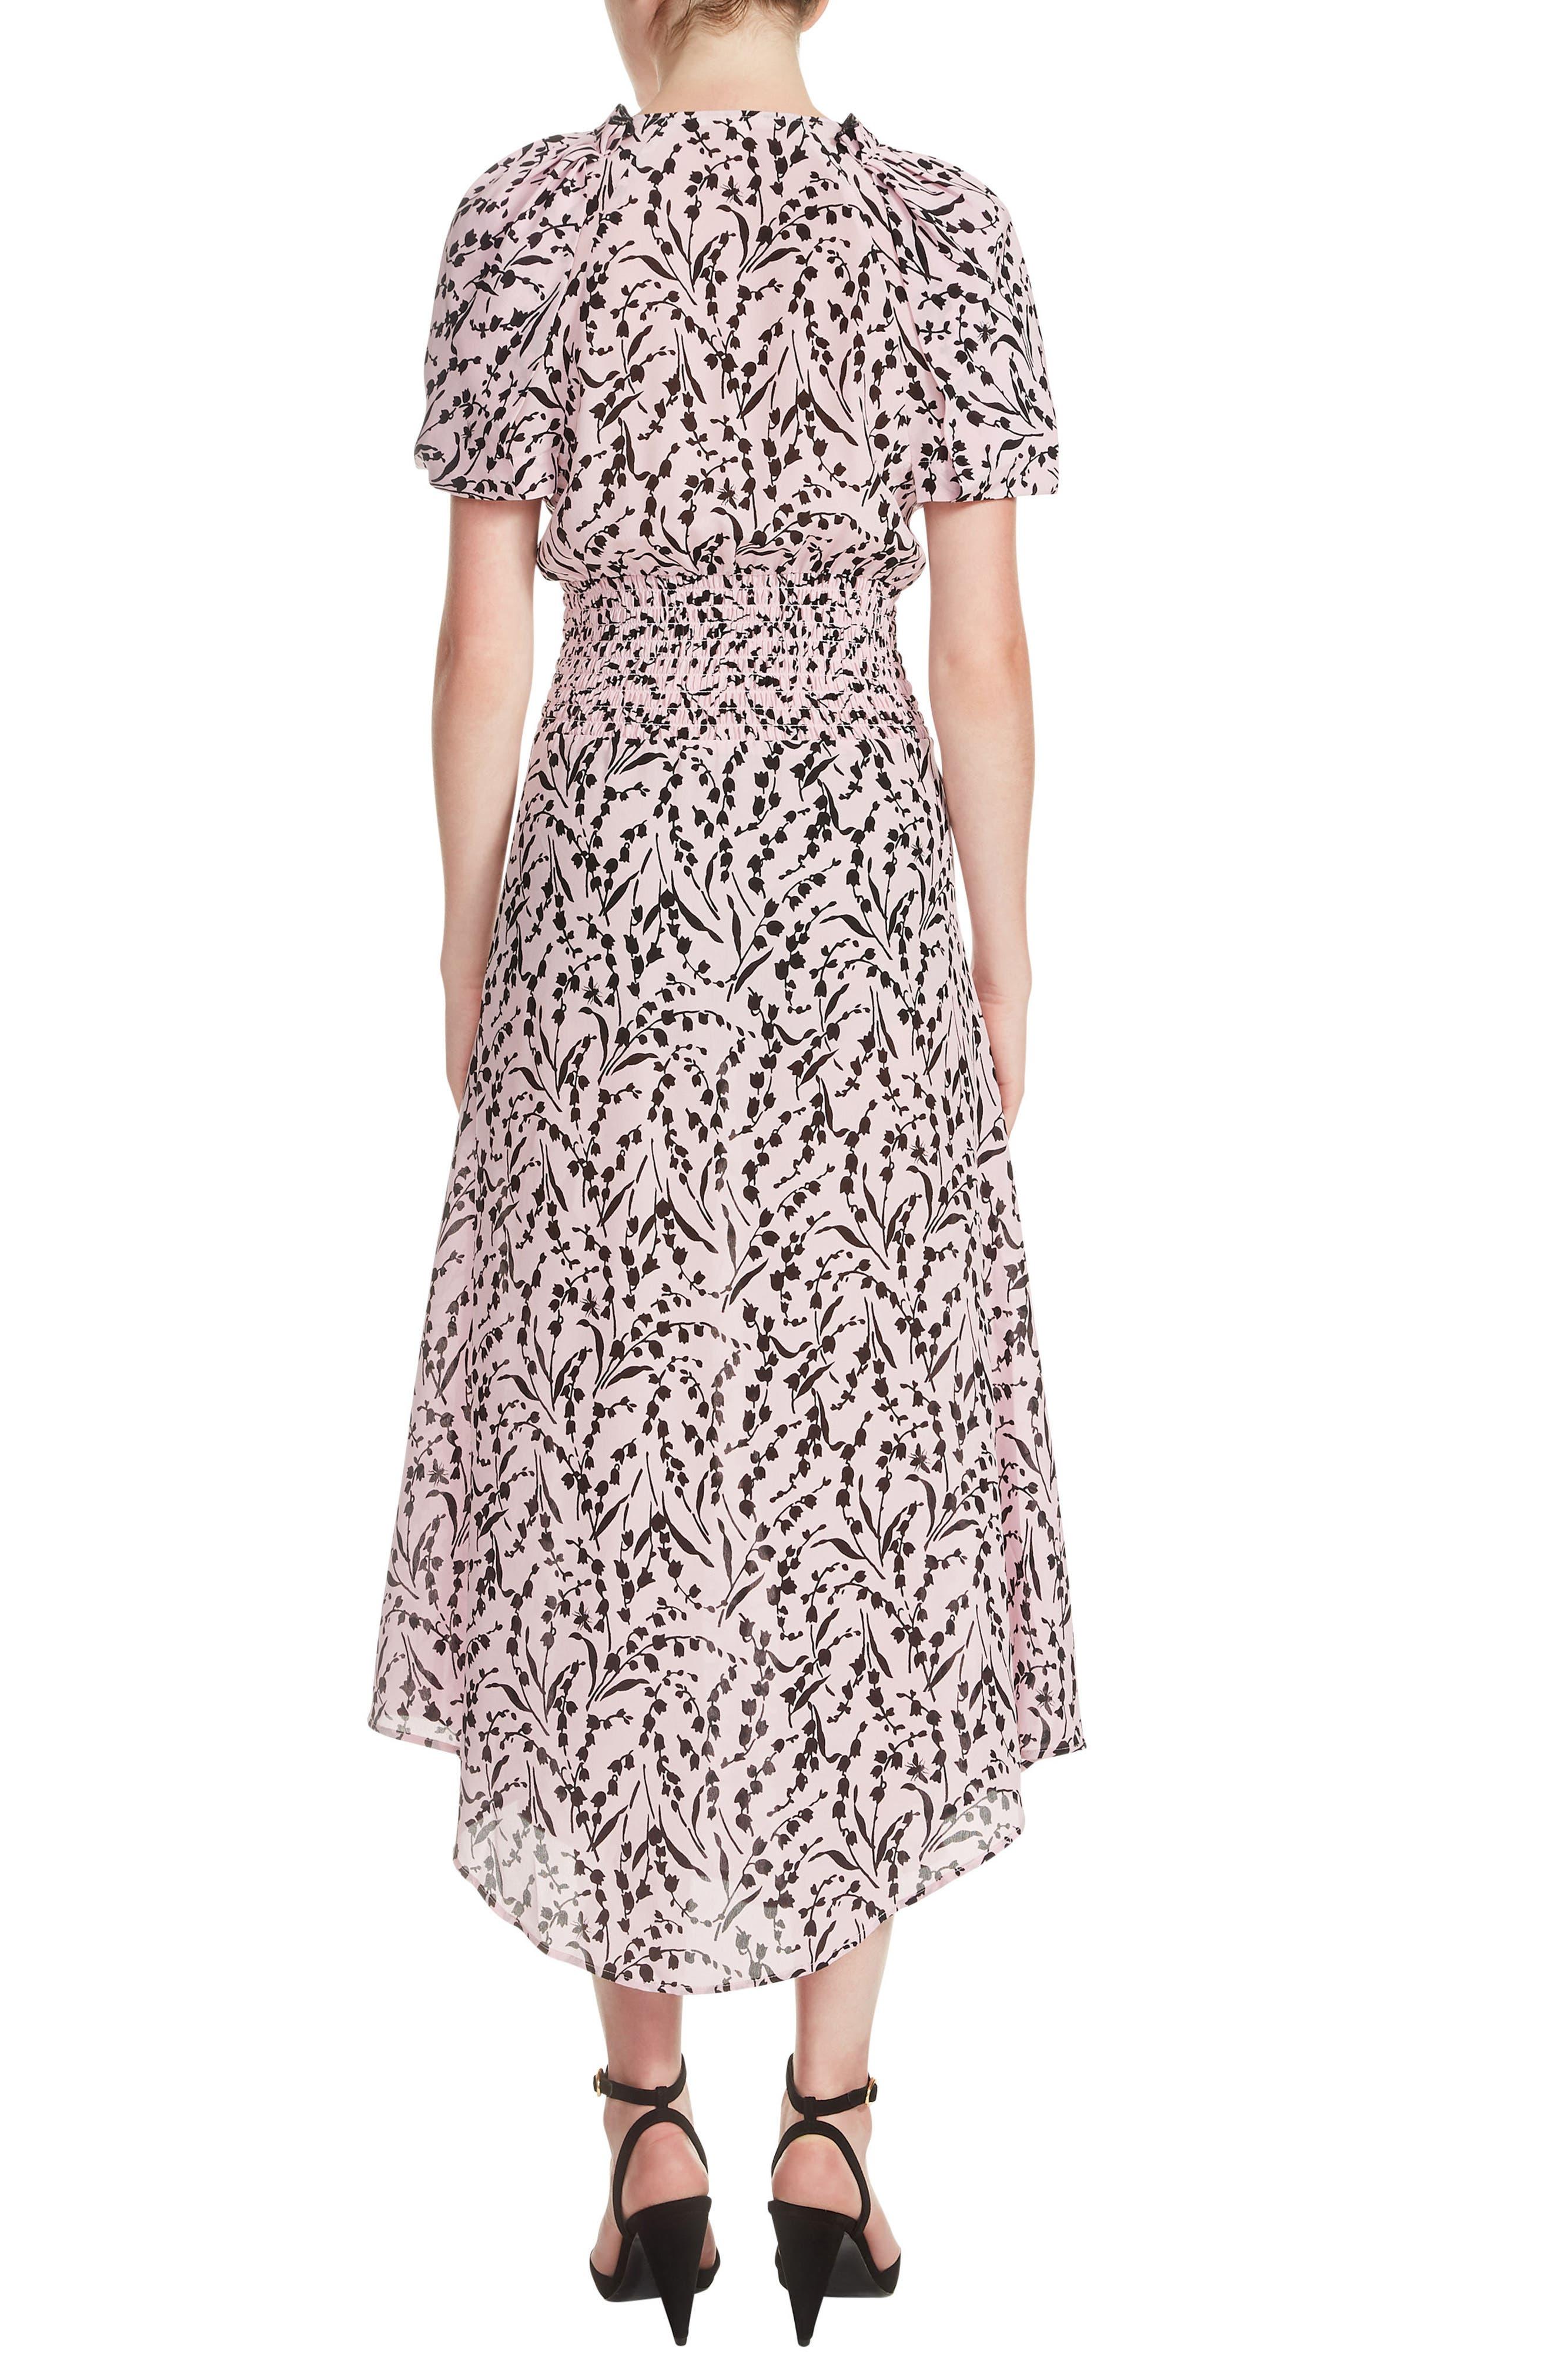 Rivara High/Low Floral Surplice Dress,                             Alternate thumbnail 2, color,                             Printed